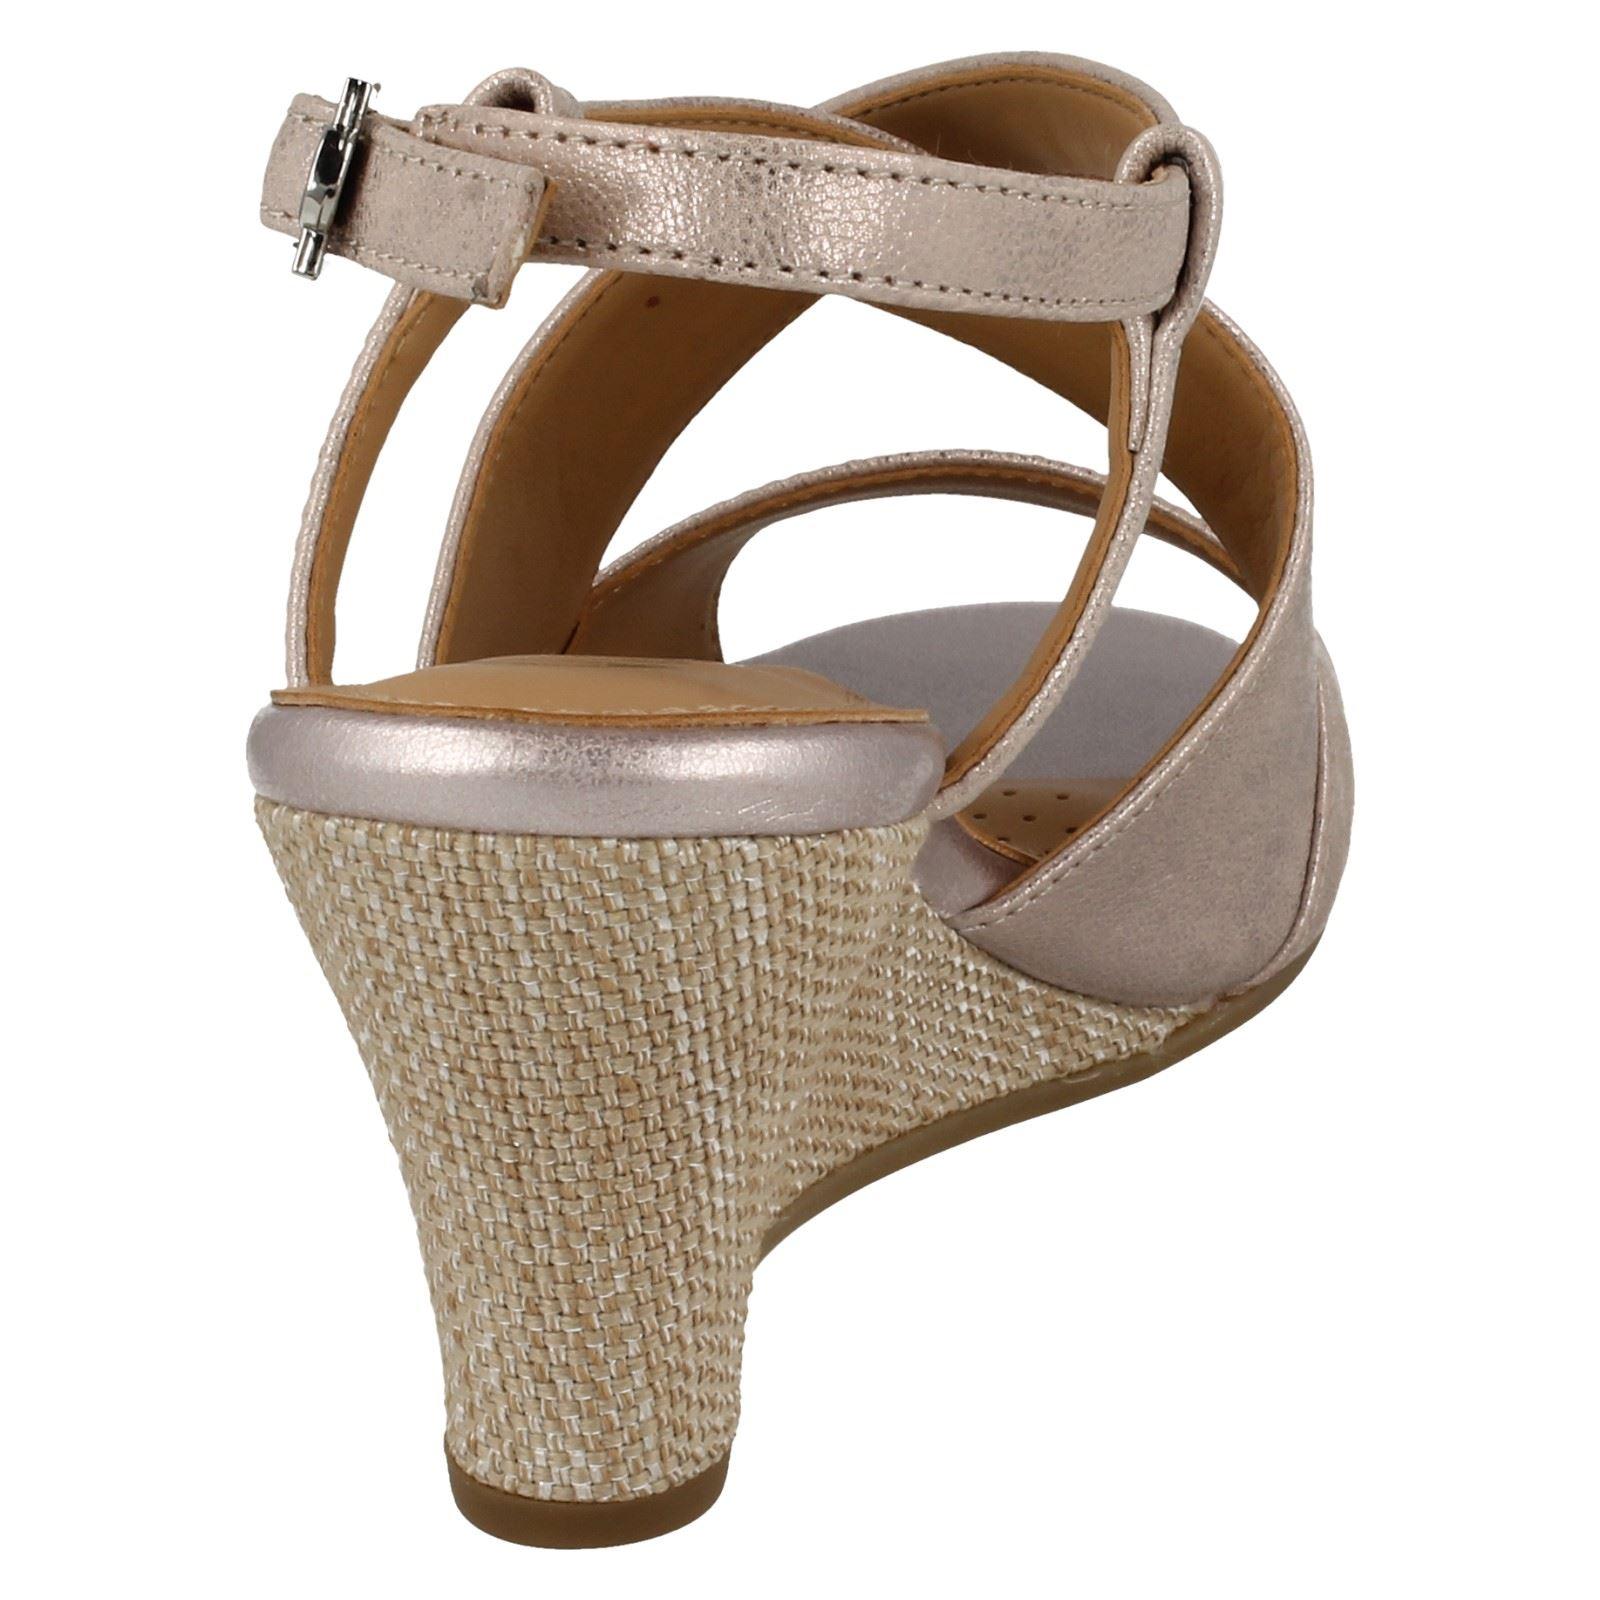 Ladies-Van-Dal-Cross-Strap-Wedged-Sandal-Allora thumbnail 9